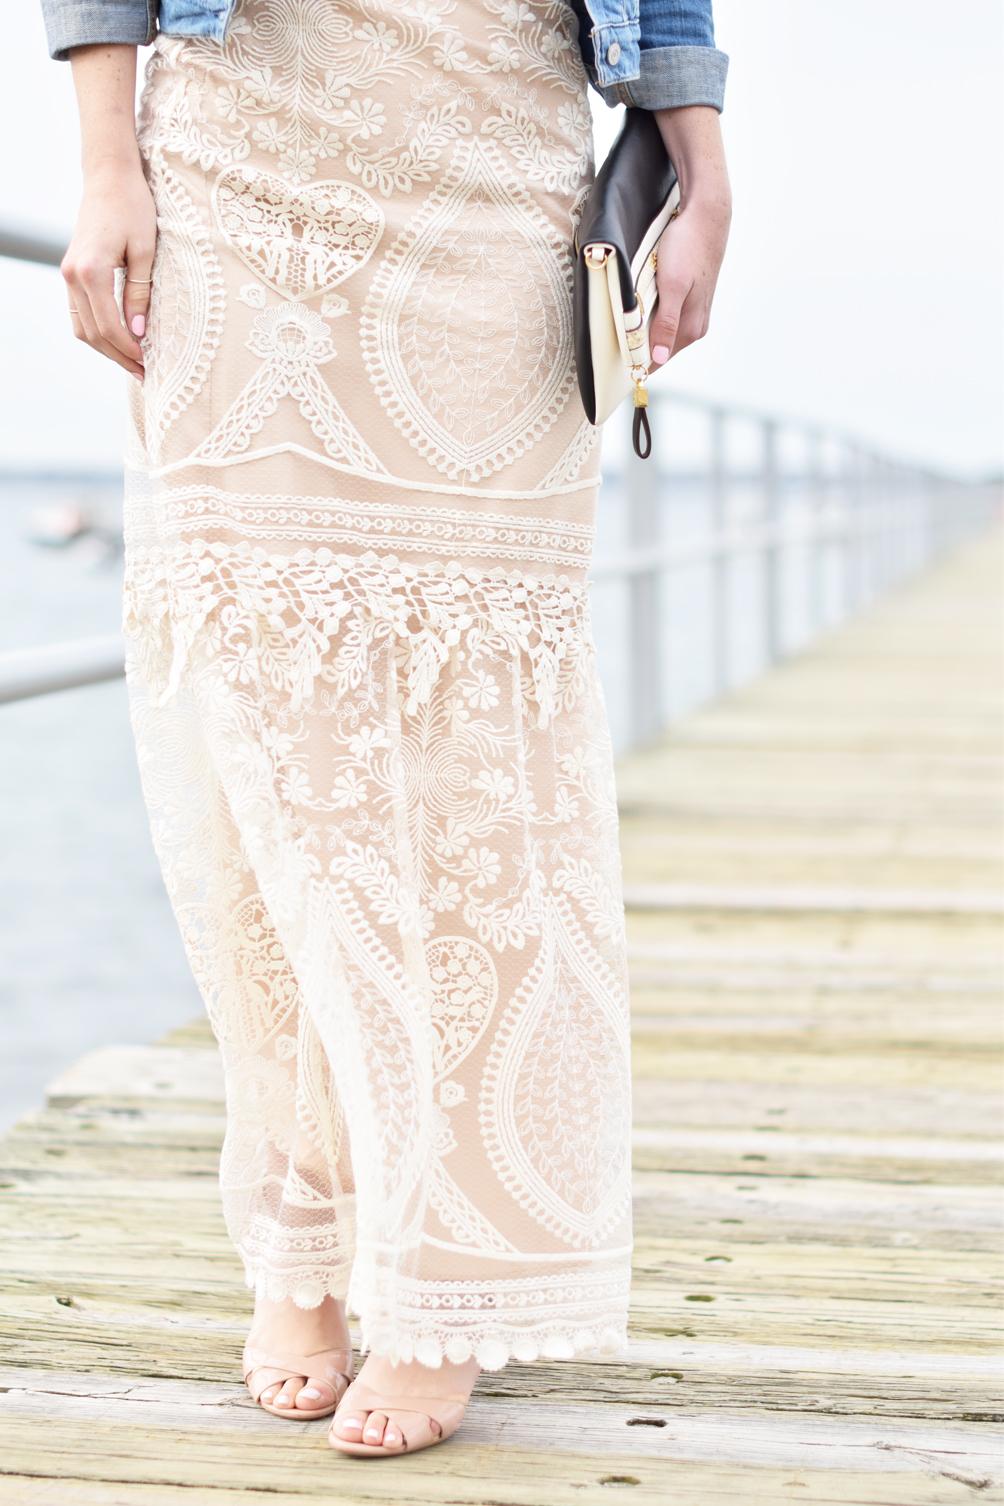 BHLDN peekaboo lace dress - one brass fox